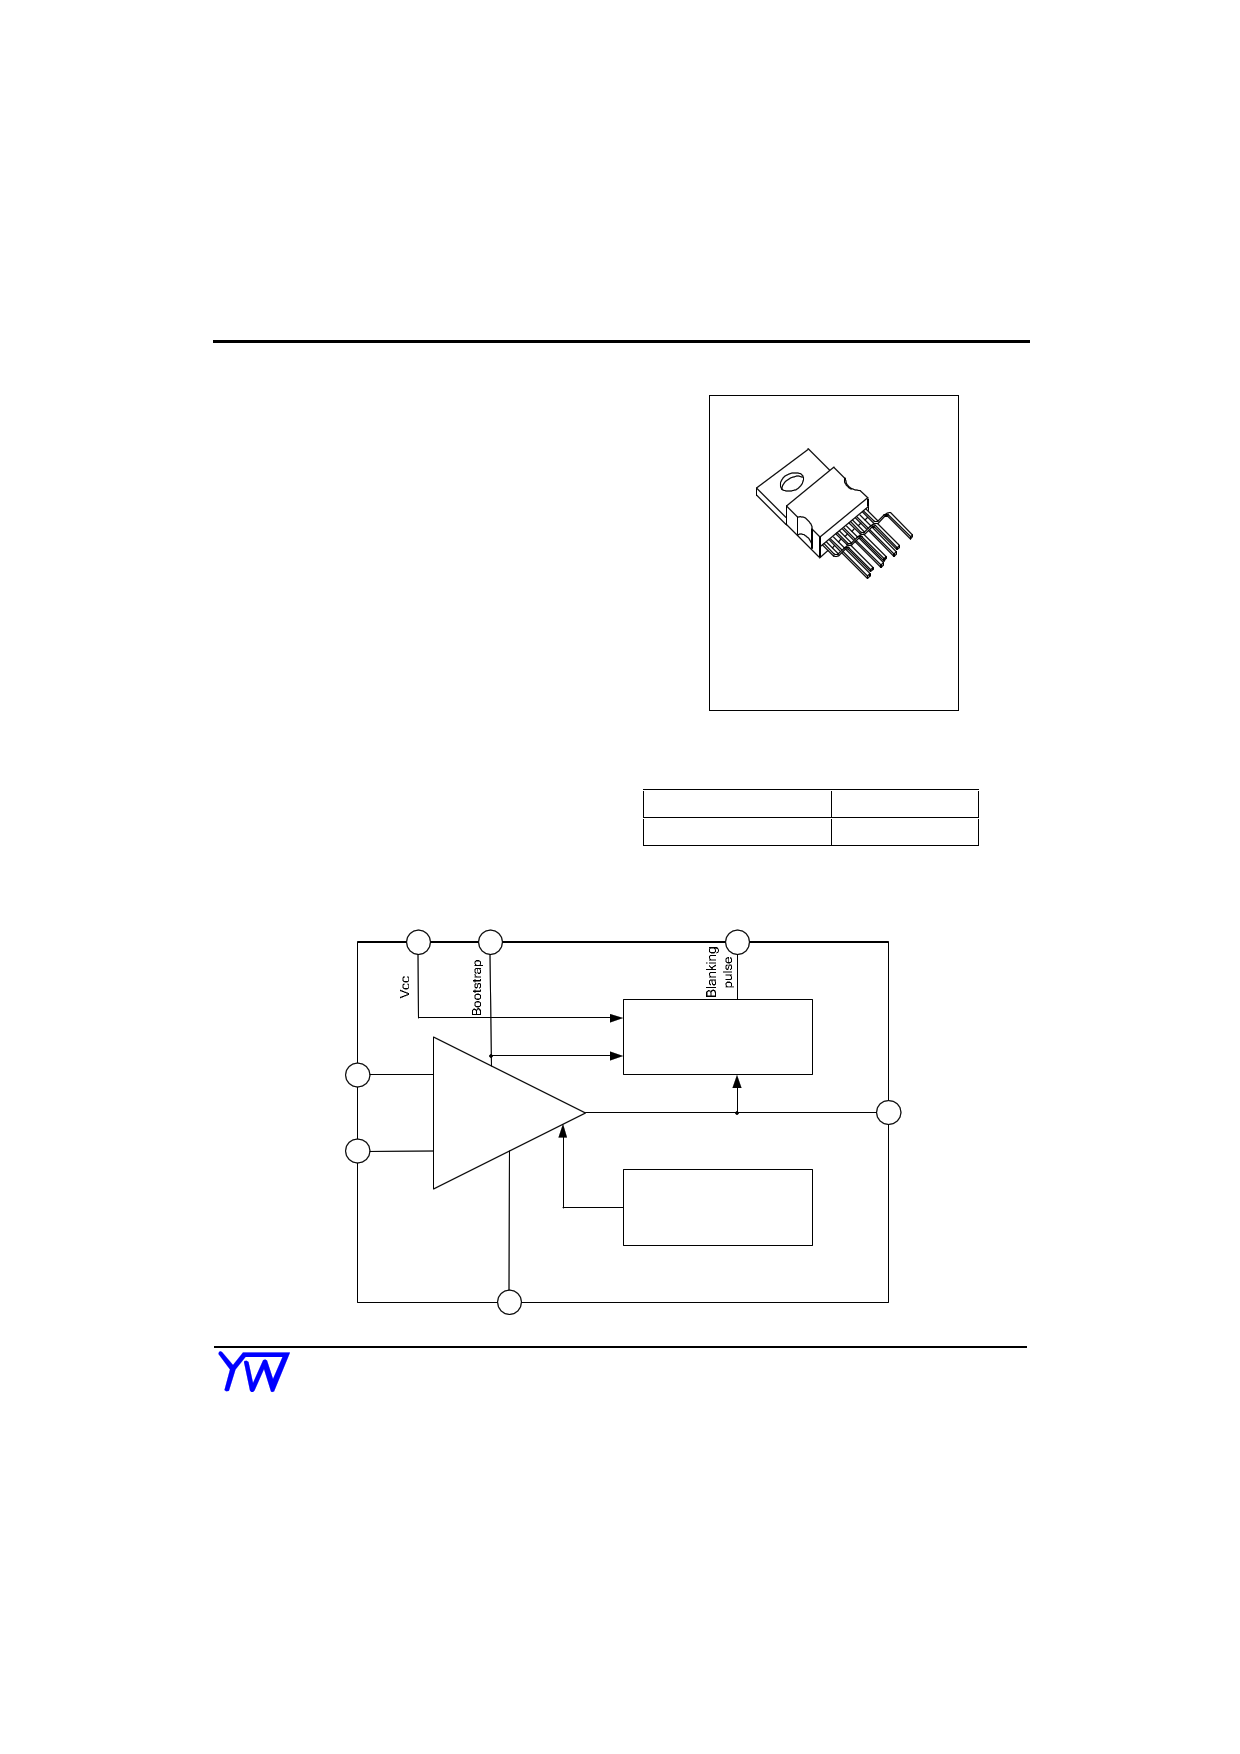 UTC78040 image